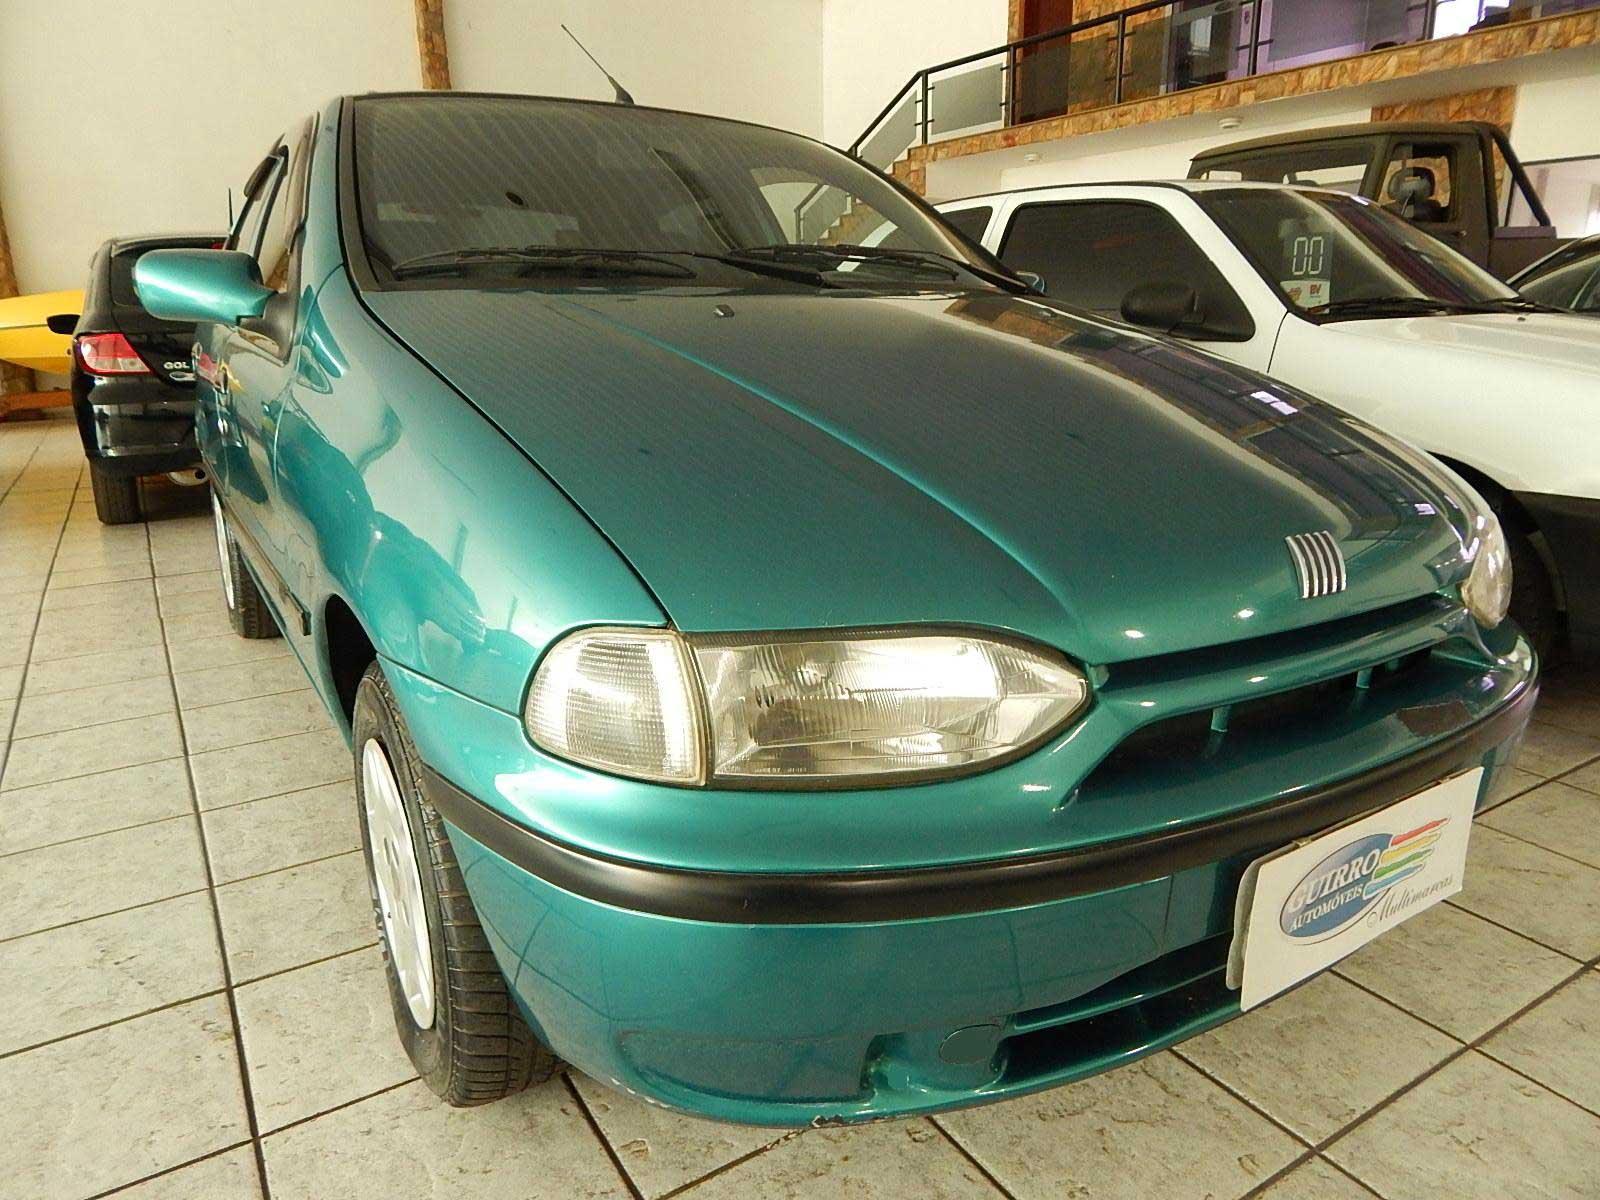 1996/1997 - Gasolina